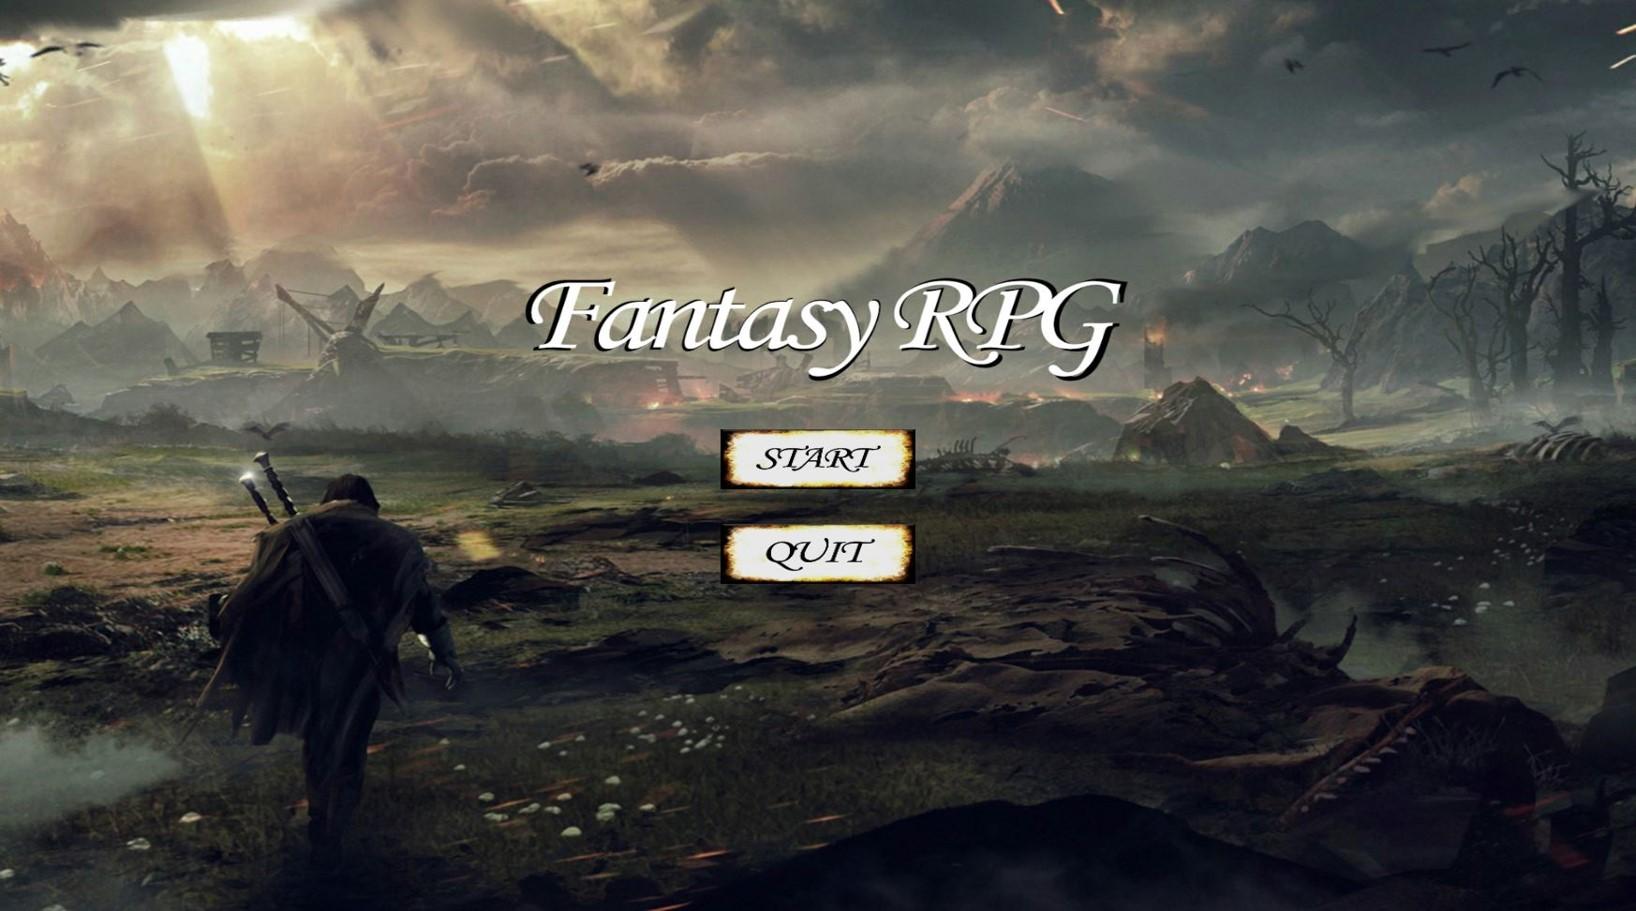 FantasyRPG